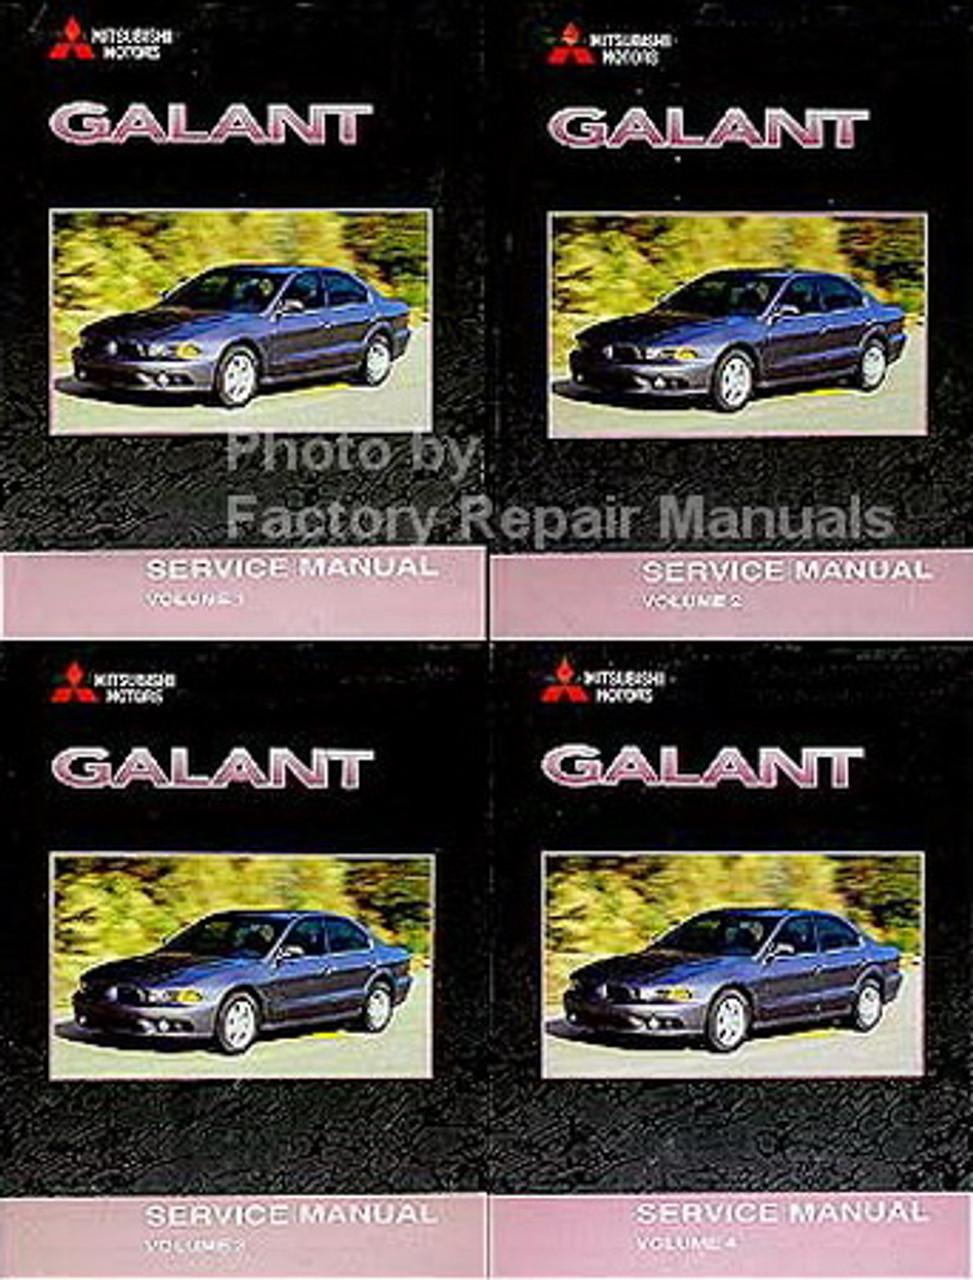 2002 Mitsubishi Galant Factory Service Manual Set Original Shop Repair